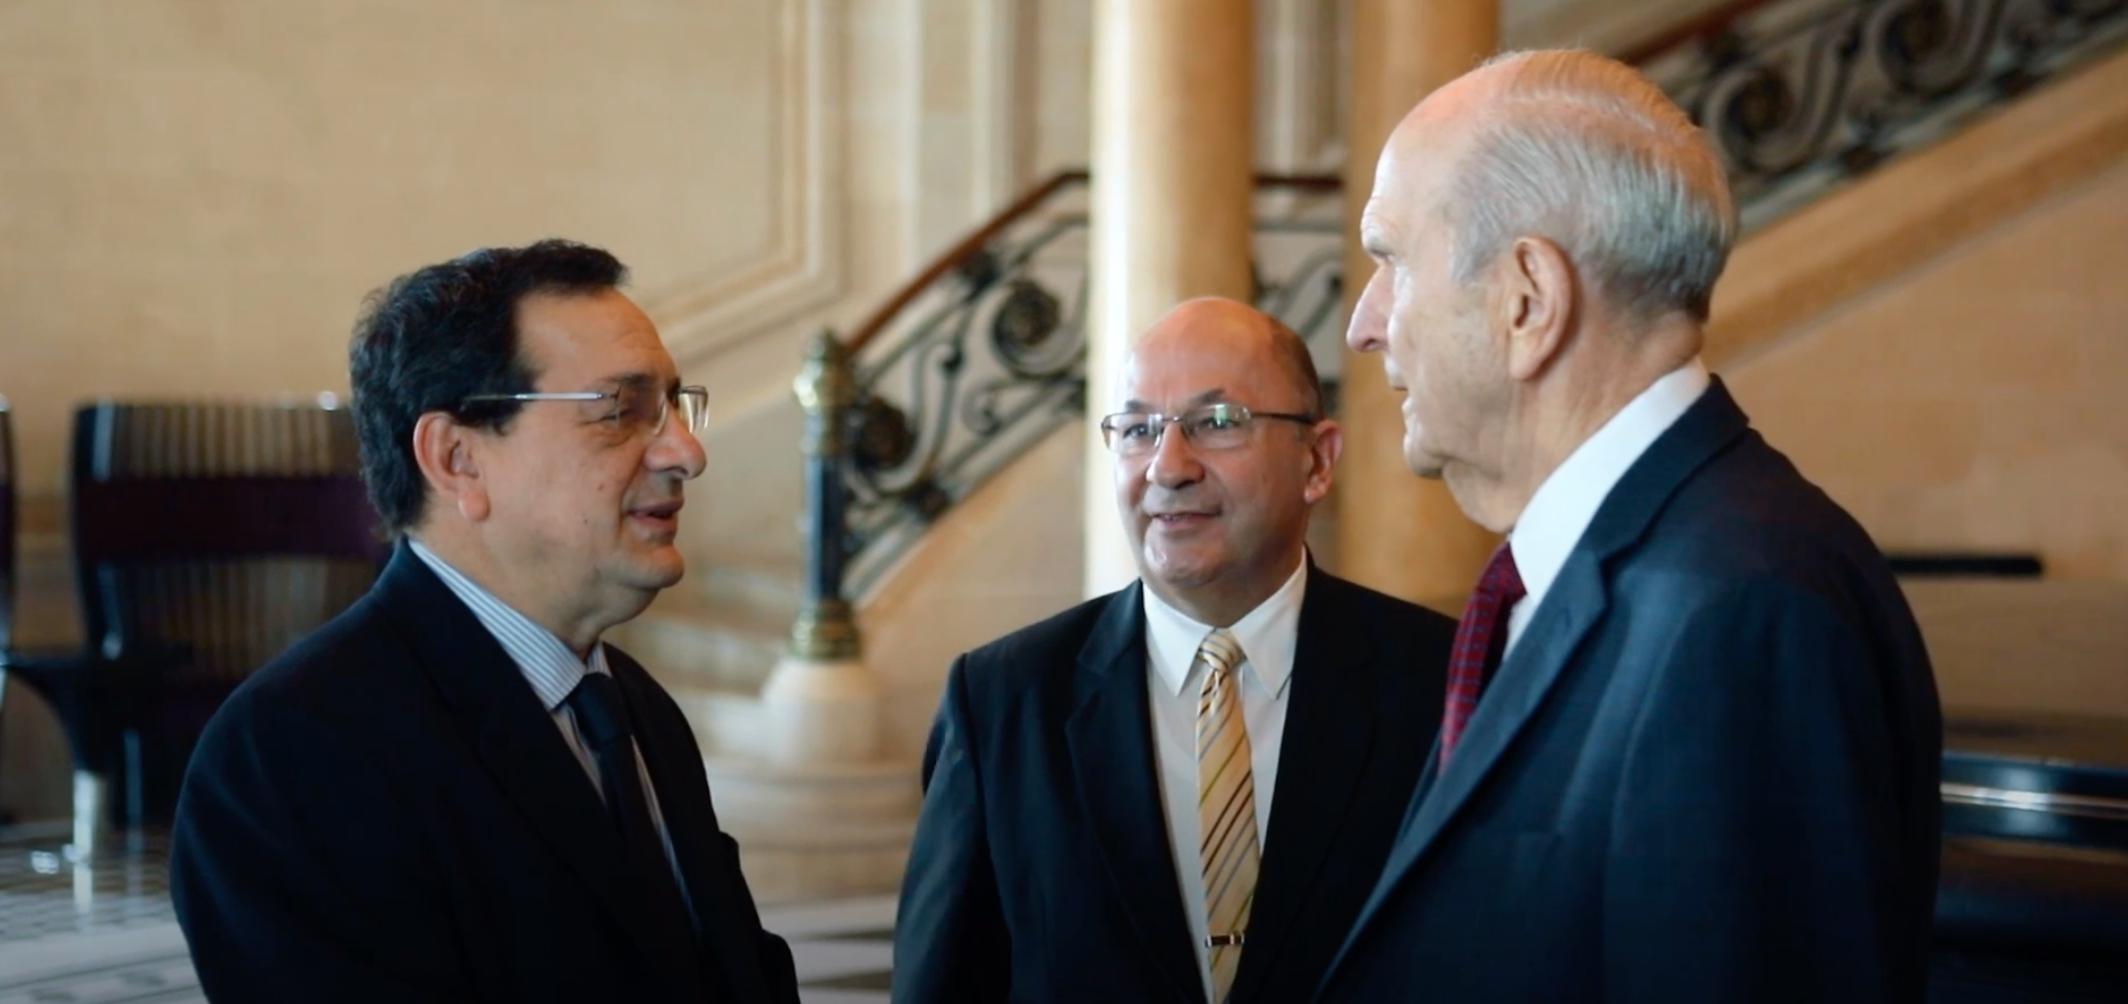 Sergio Rubin, left, speaks with President Russell M. Nelson.